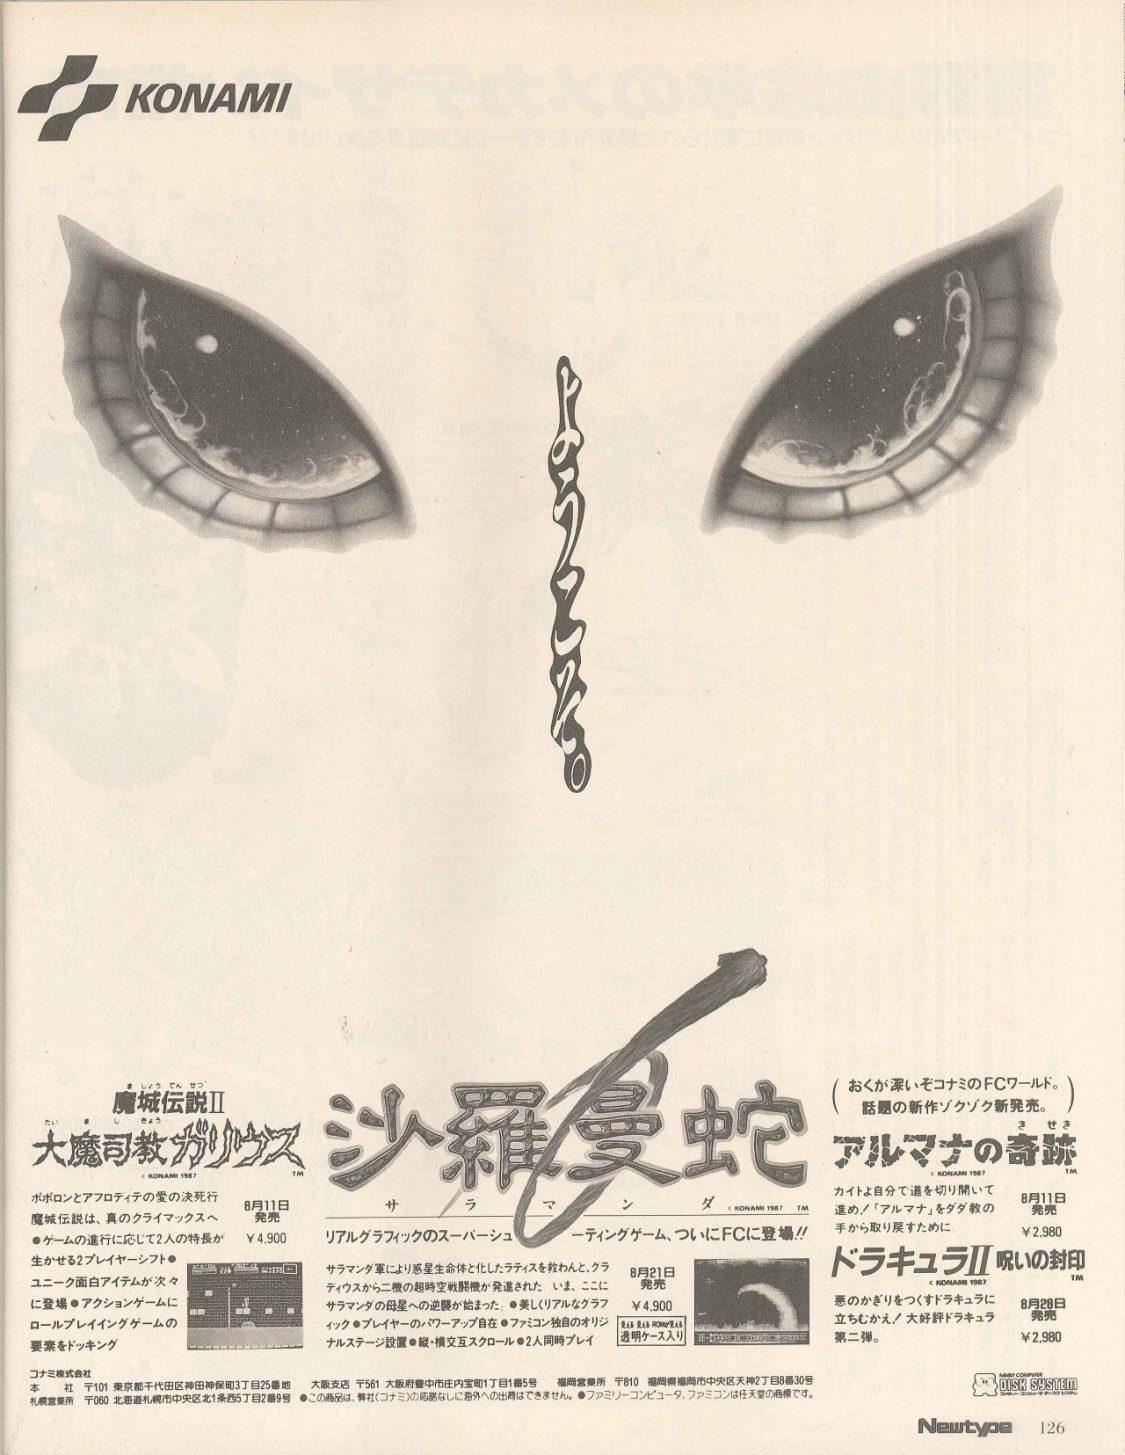 Konami Poster - Cárter Studio Moodboard